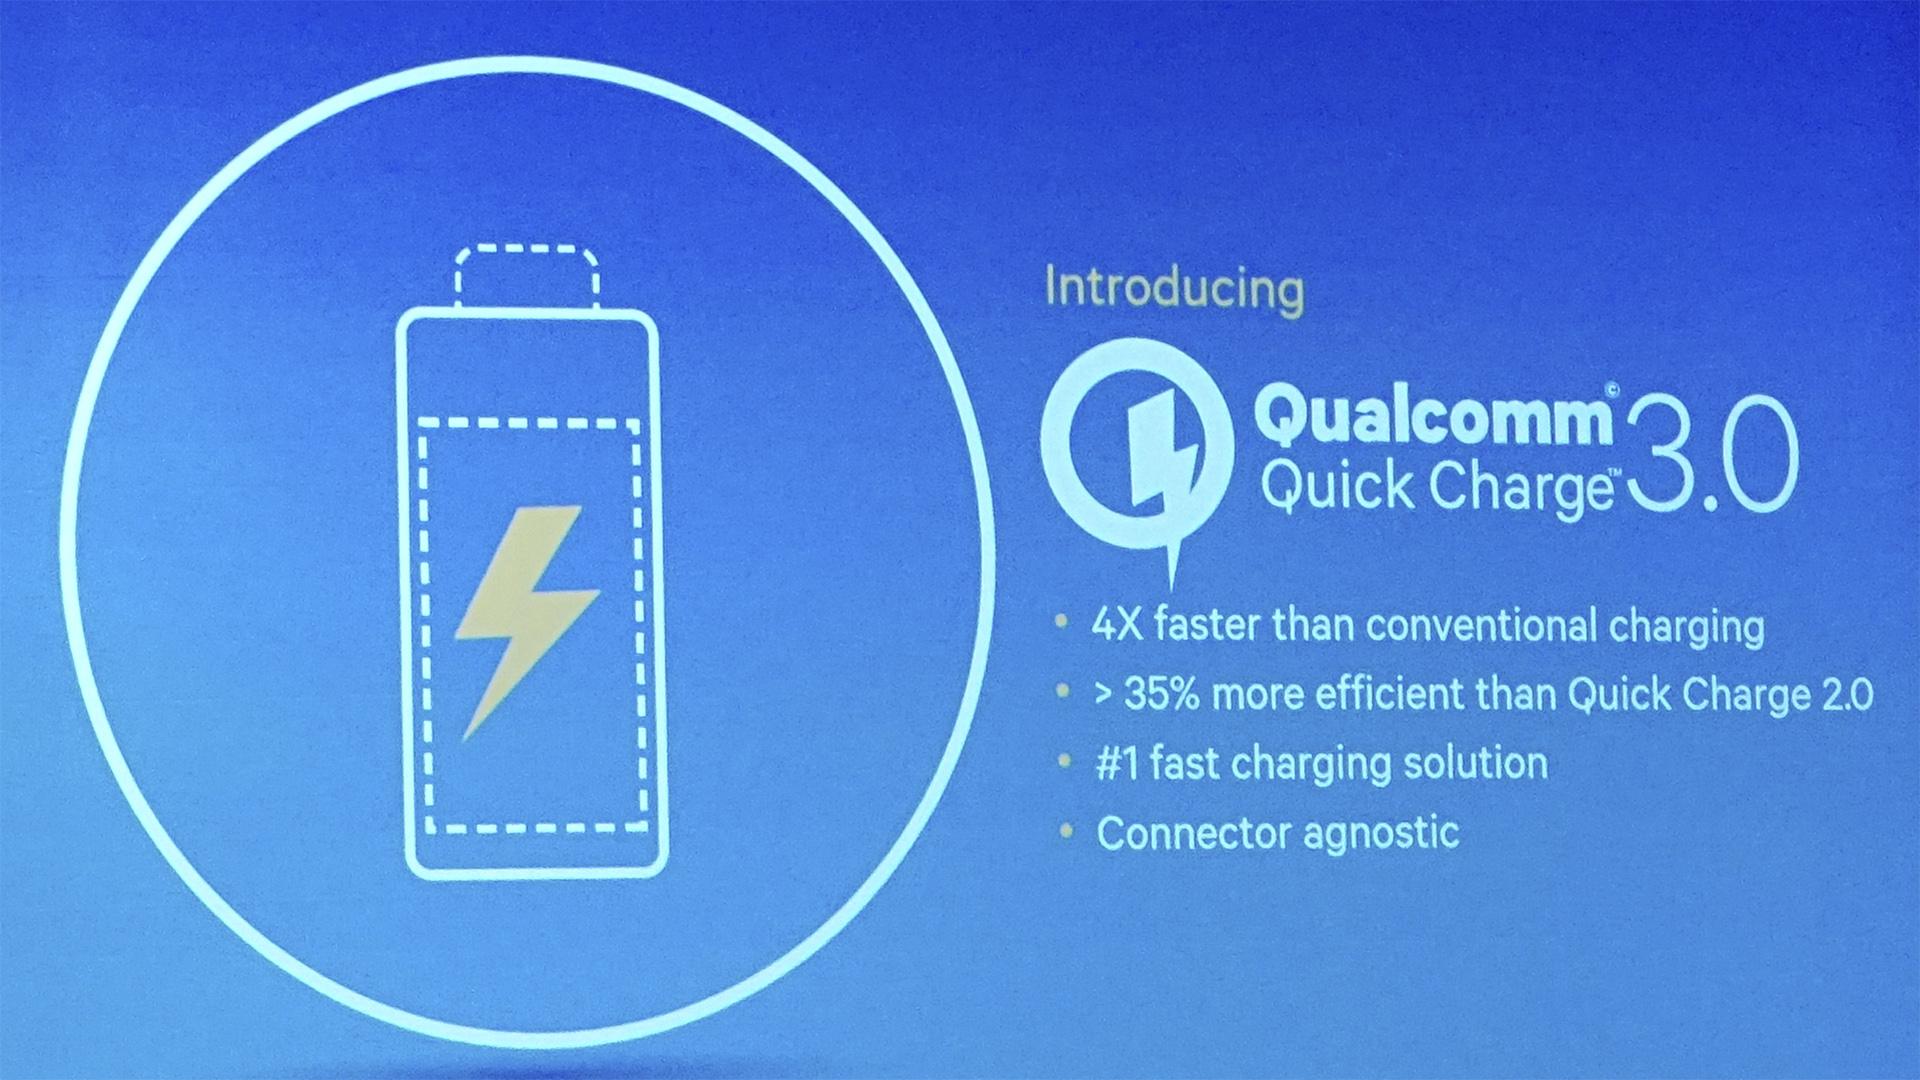 Qualcomm 深耕 Quick Charge 已見成果,Wireless Charging 仍需更多心力投入